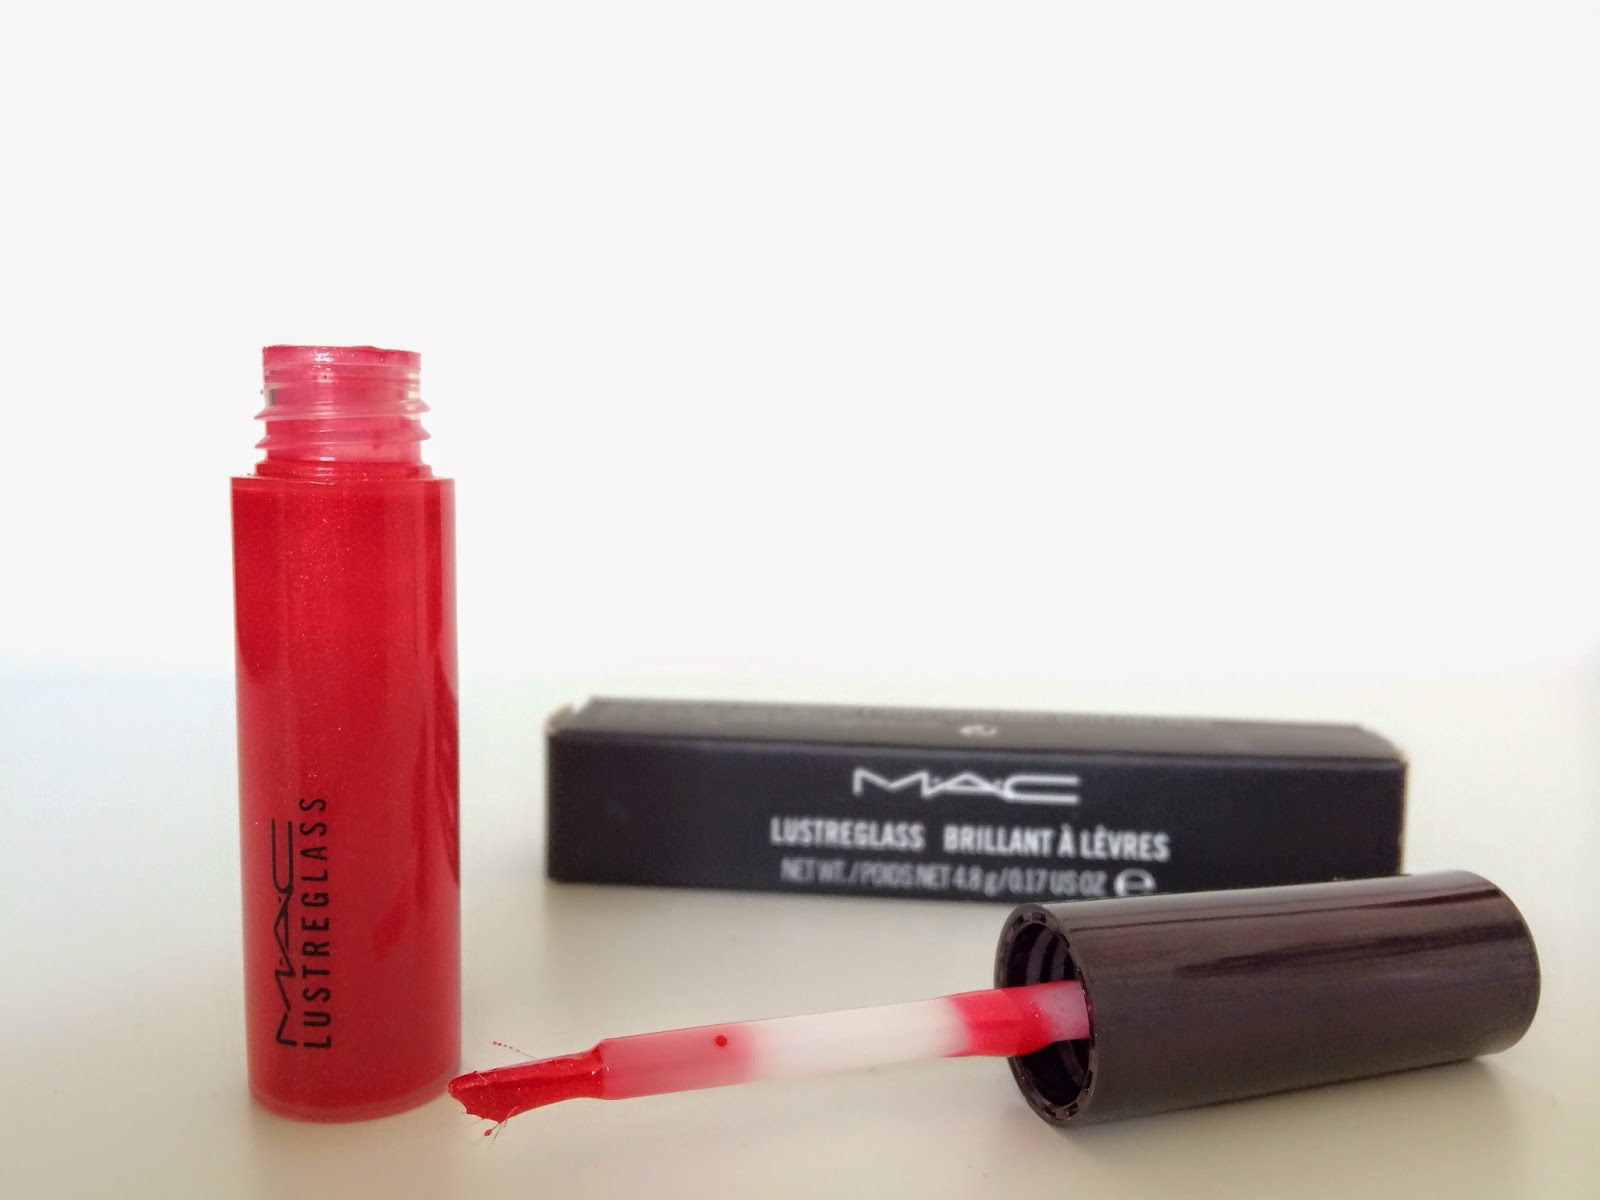 MAC lustreglass venetian lipgloss